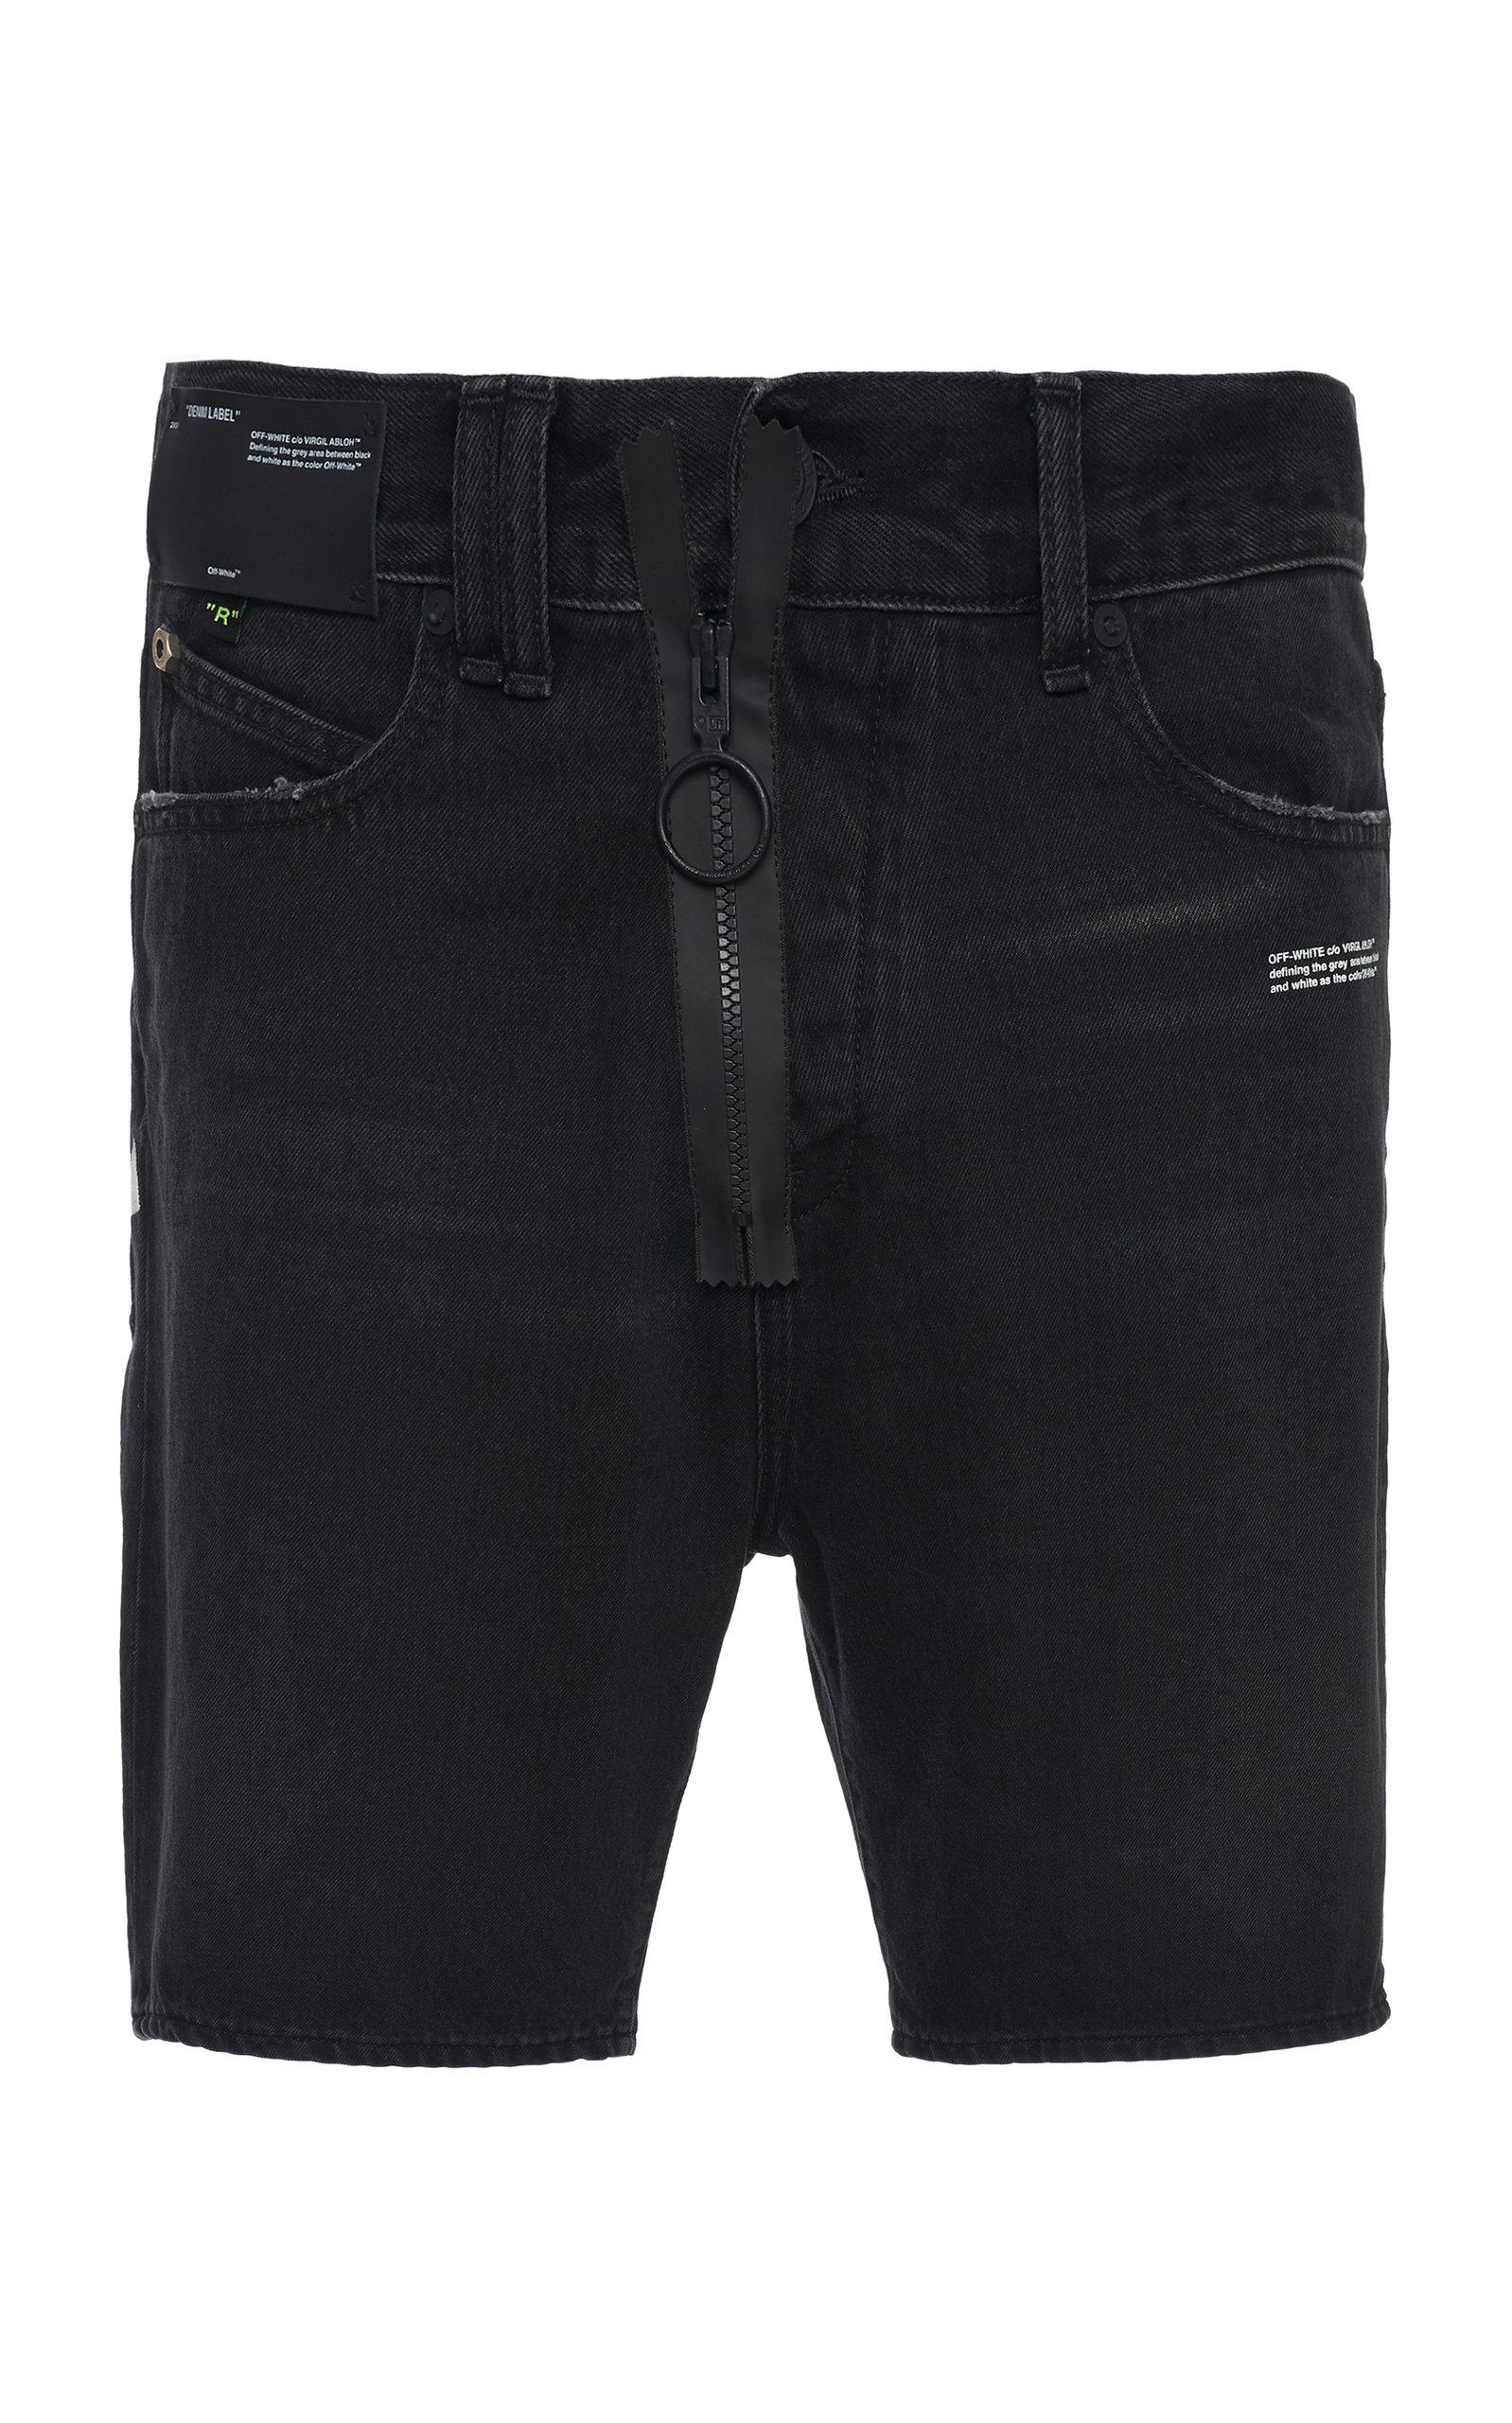 eb62c2d412a1 Off-White c o Virgil AblohDenim Slim-Leg Shorts. CLOSE. Loading